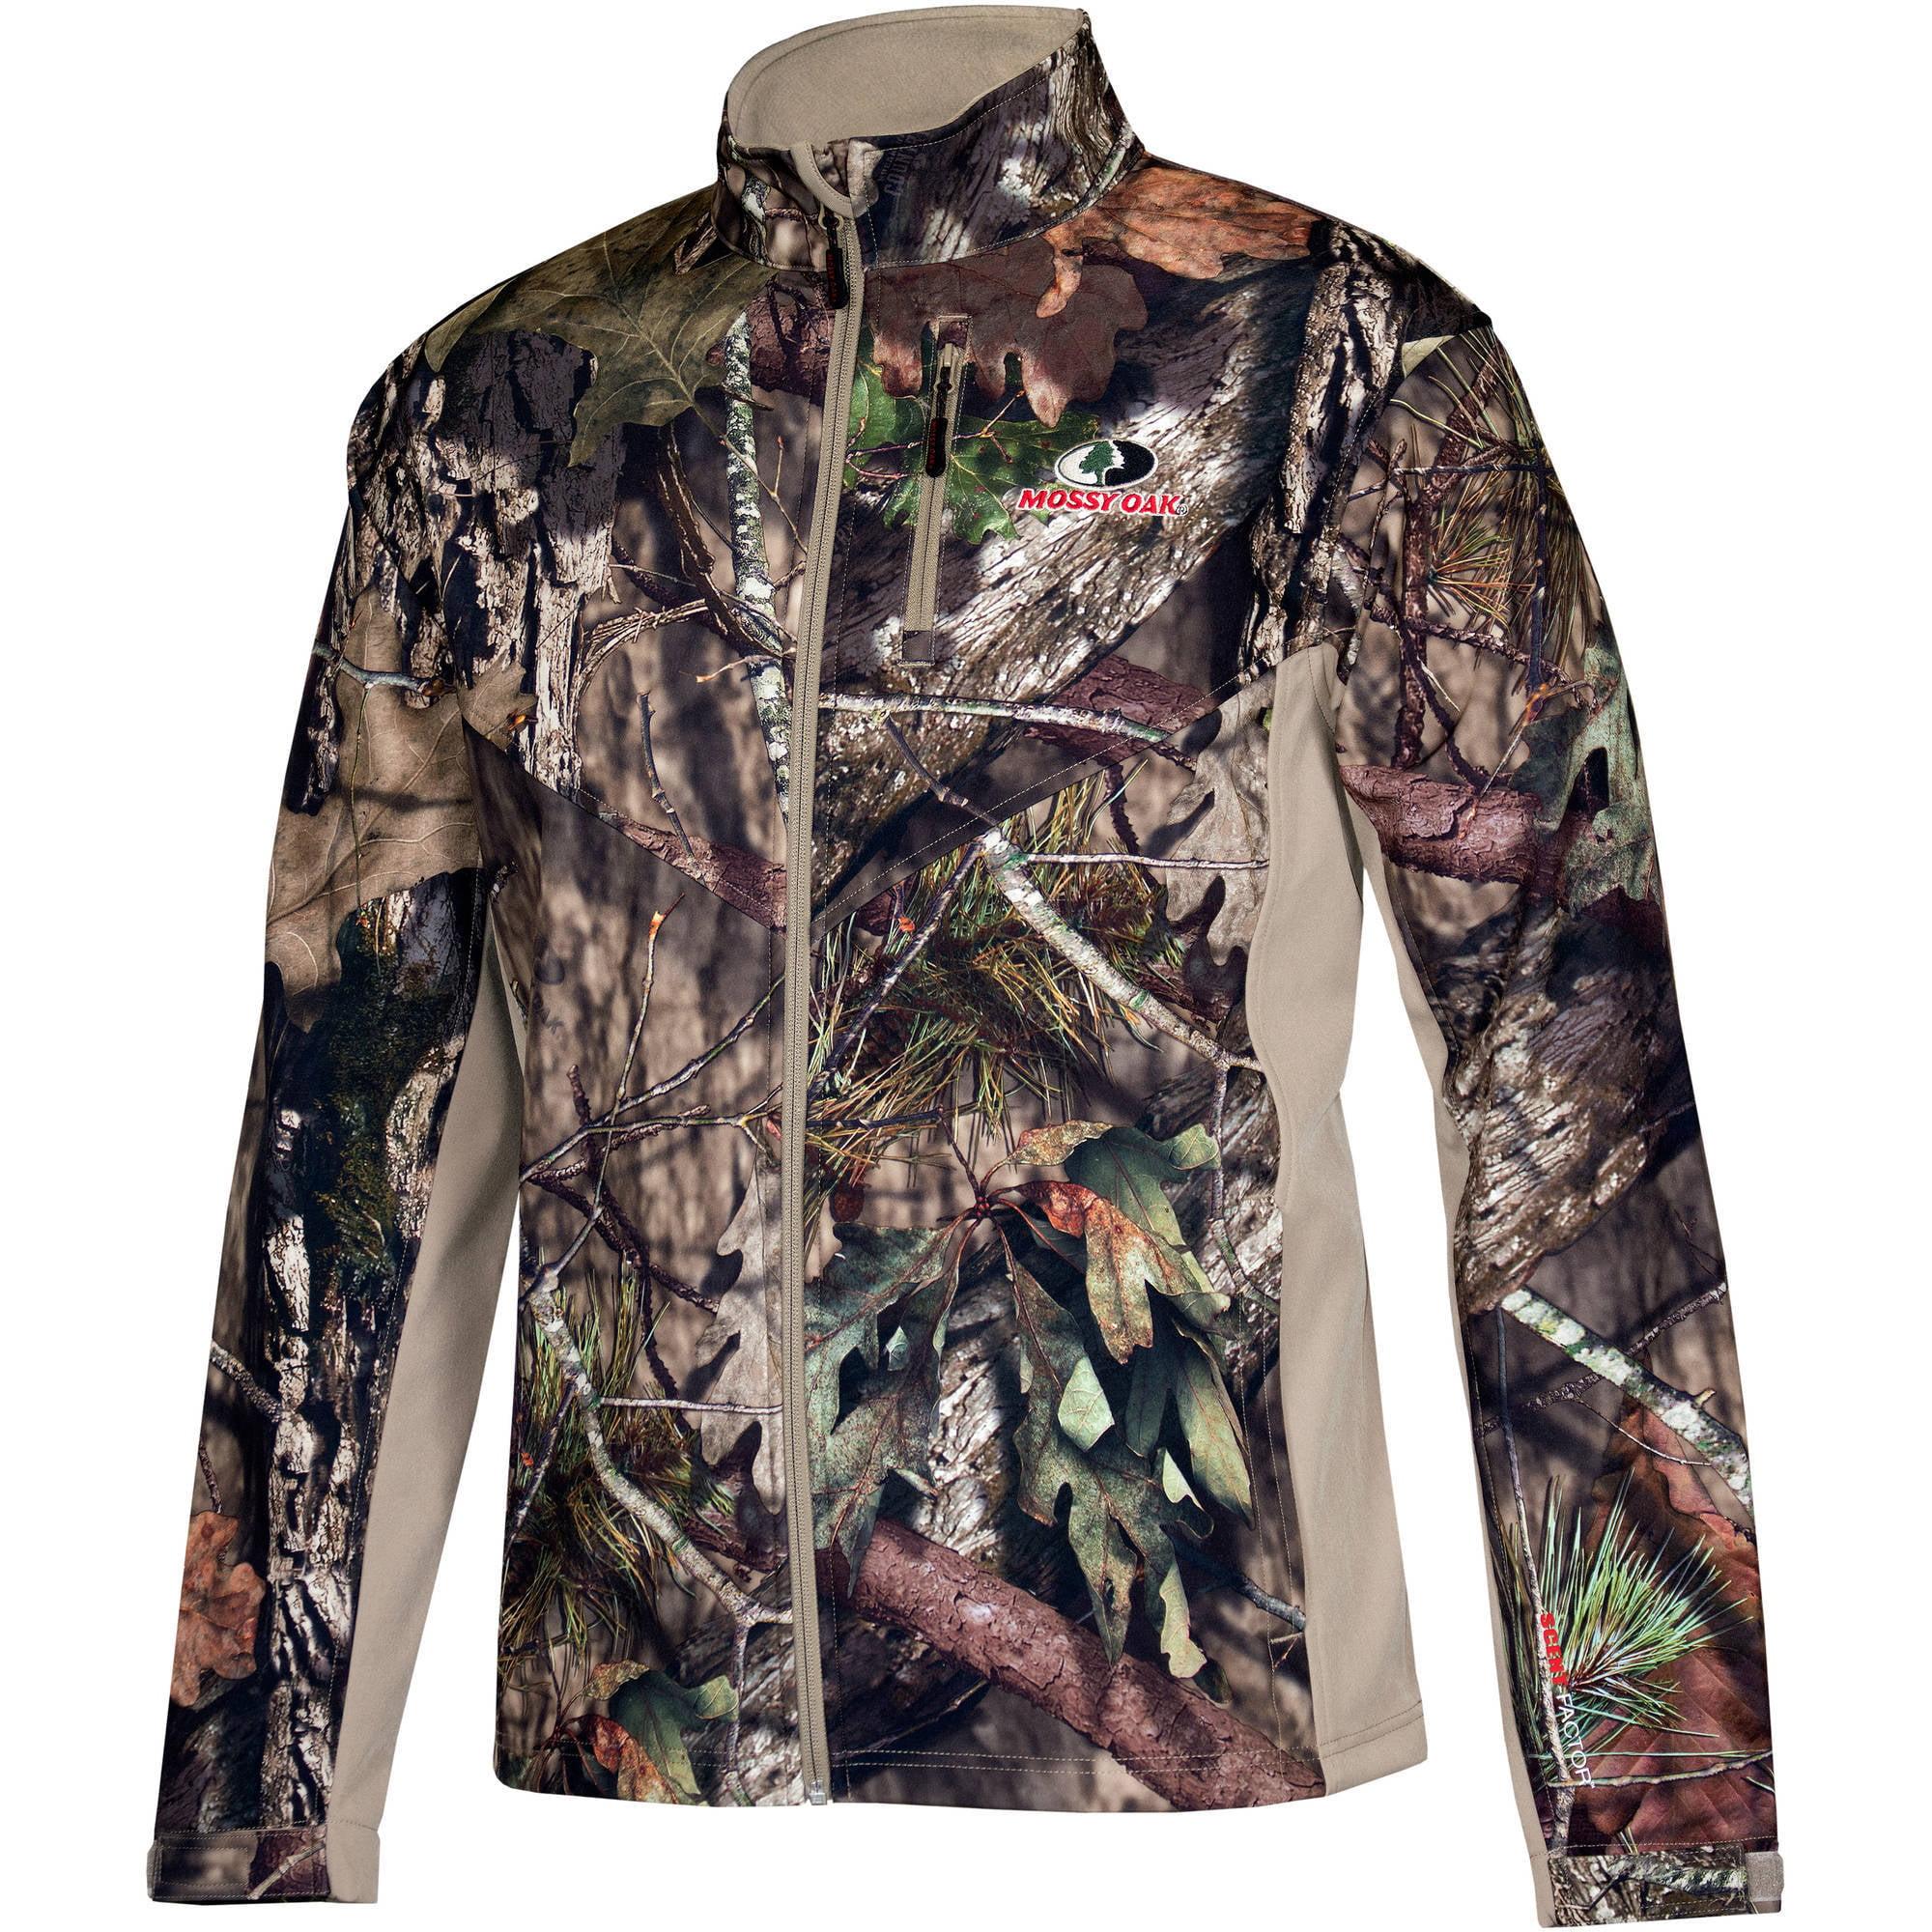 Men's Softshell Jacket by IMPORT-MAHCO INC